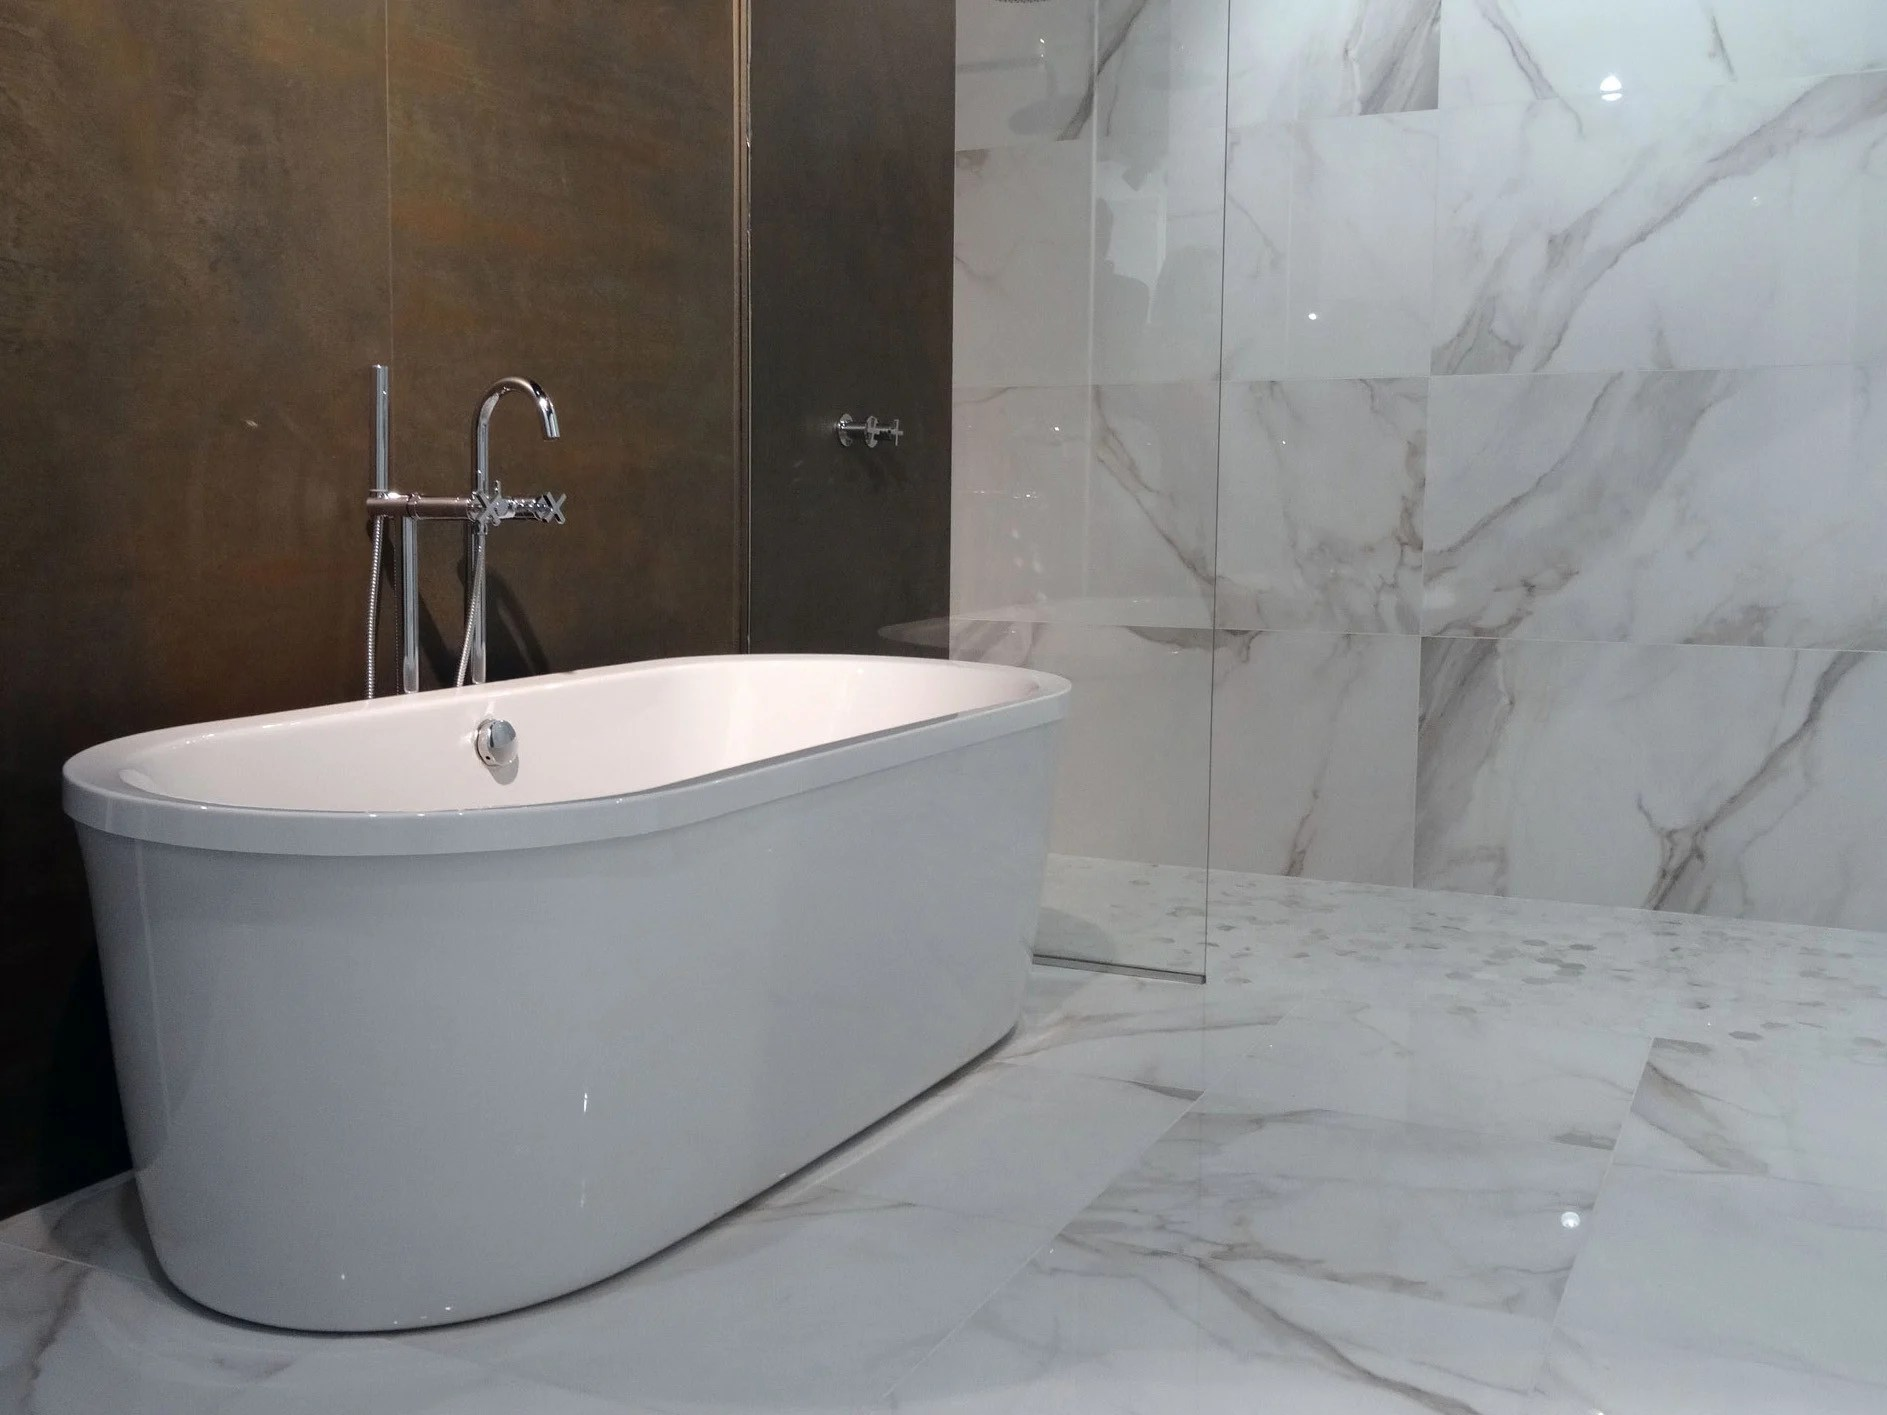 vde badezimmer vde beleuchtung badezimmer makeup eitelkeit beleuchtung ikea. Black Bedroom Furniture Sets. Home Design Ideas